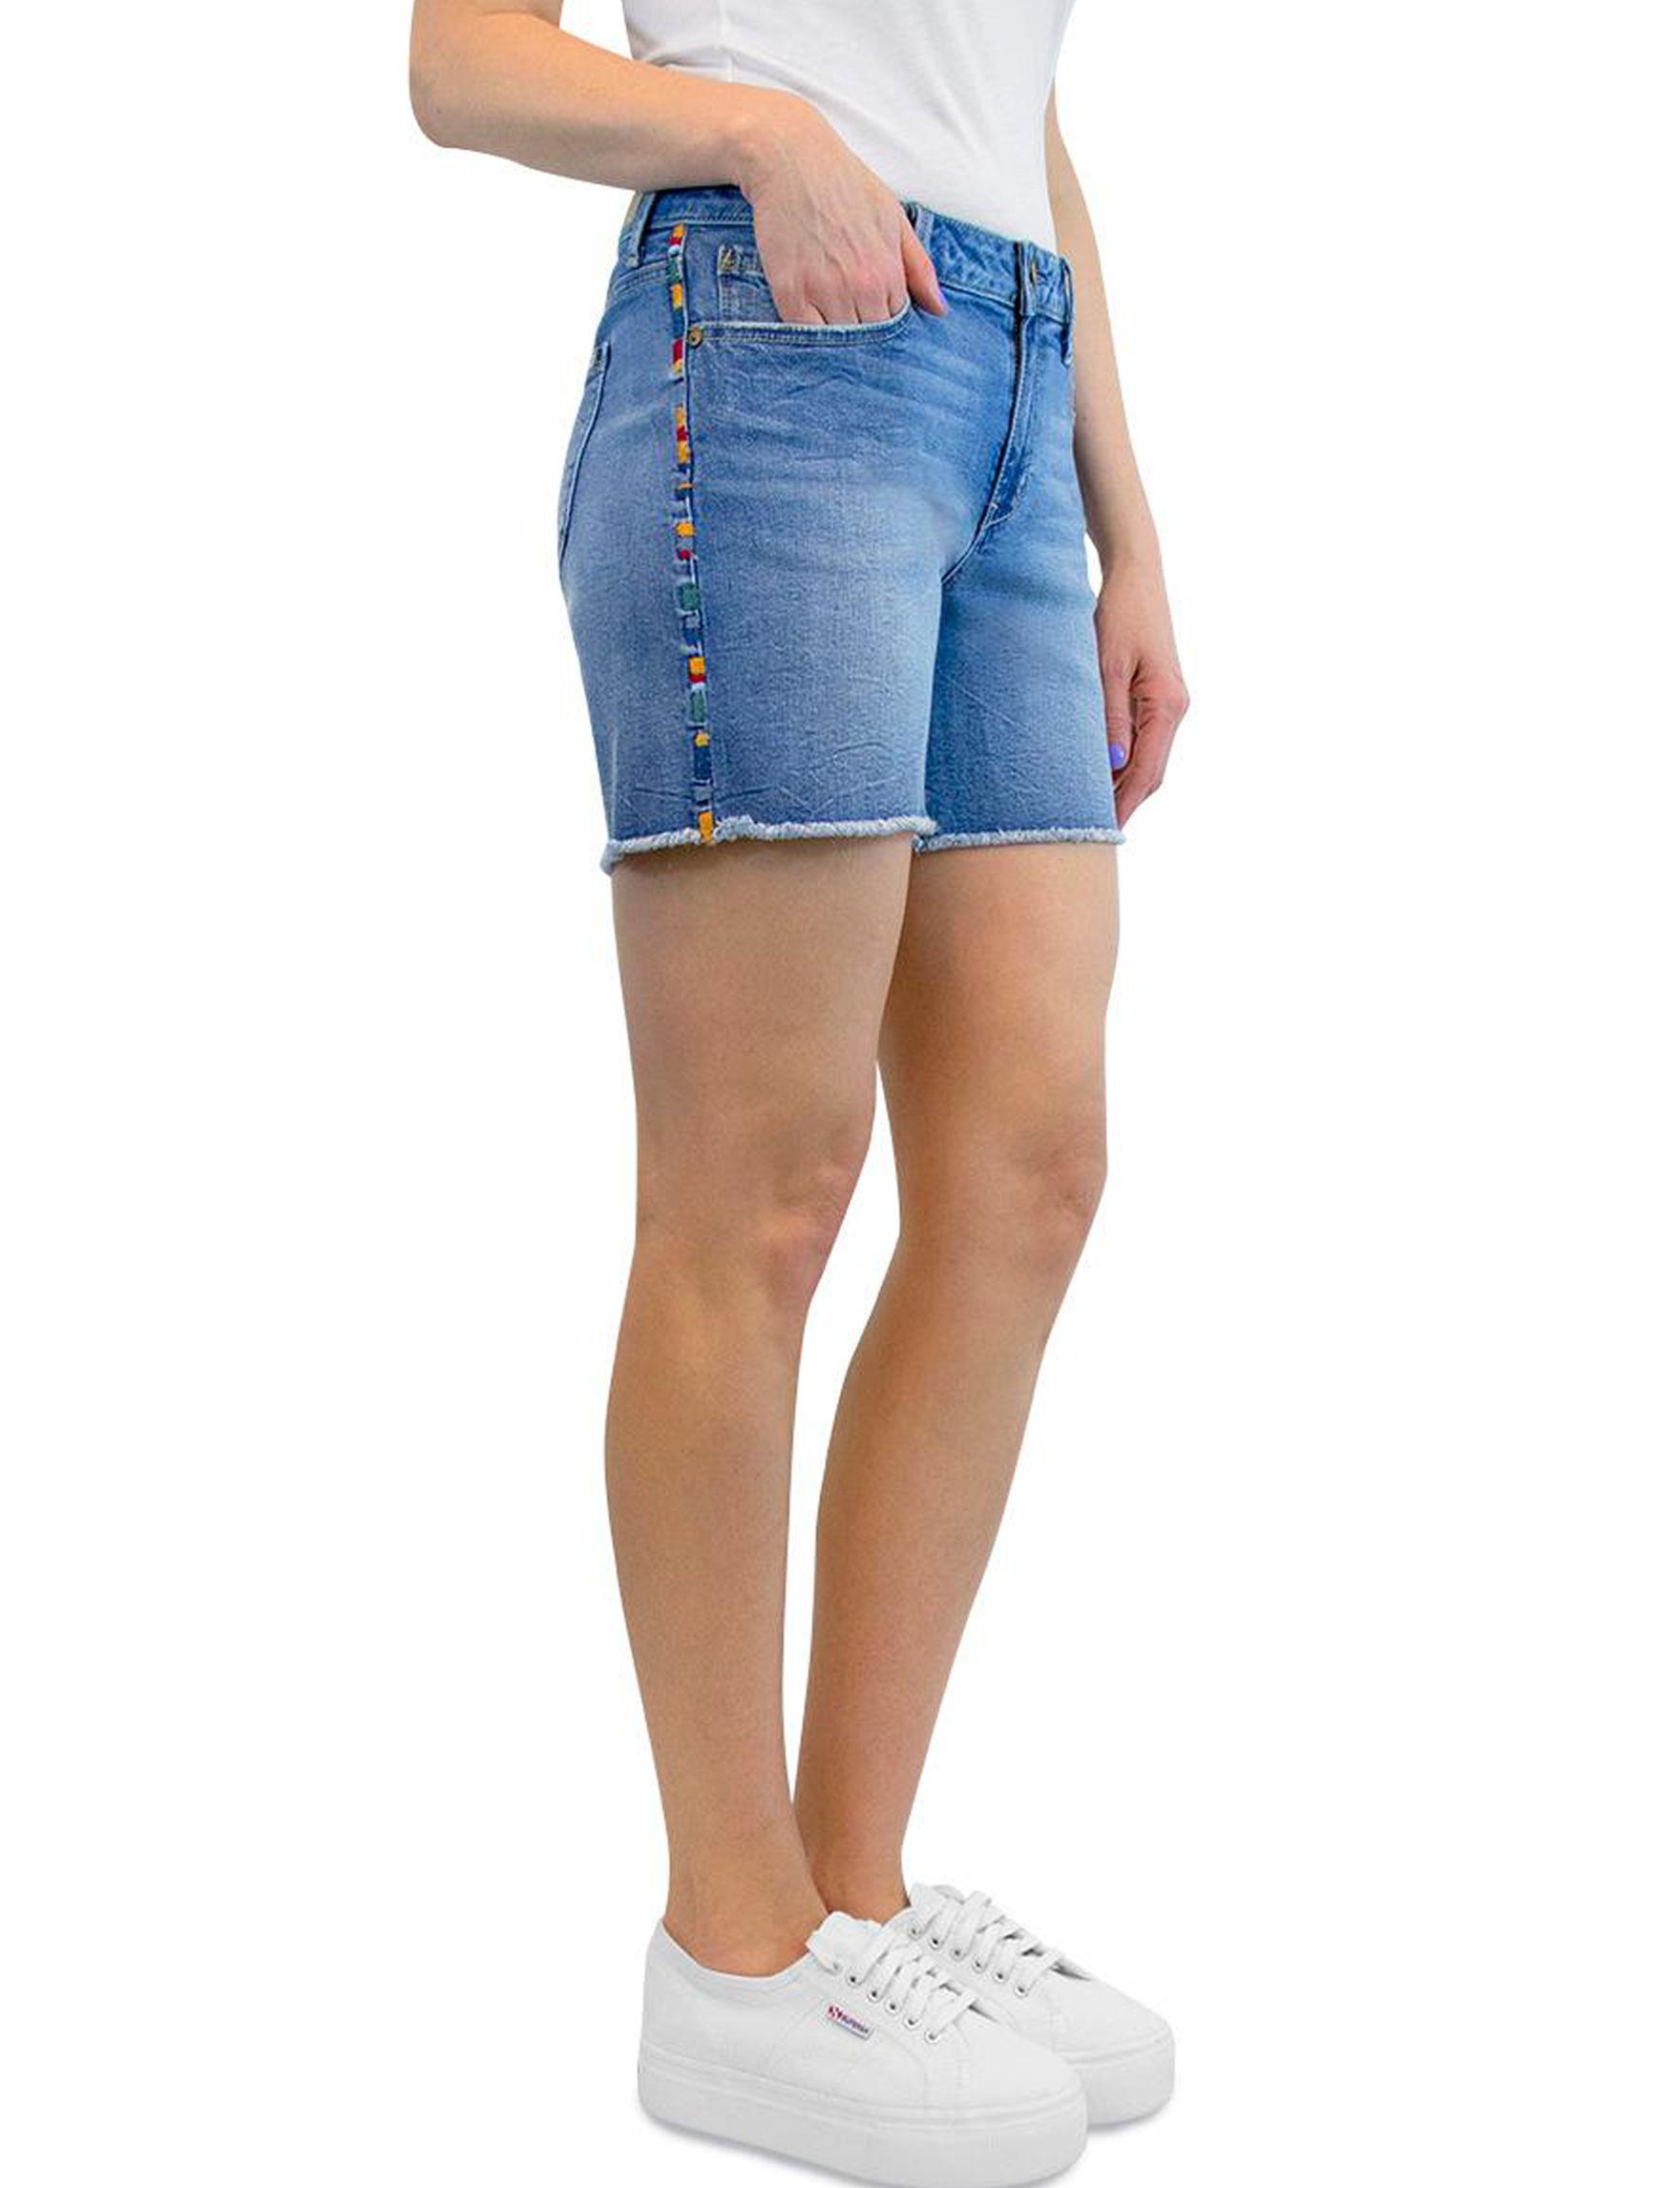 Seven 7 Blue Denim Shorts